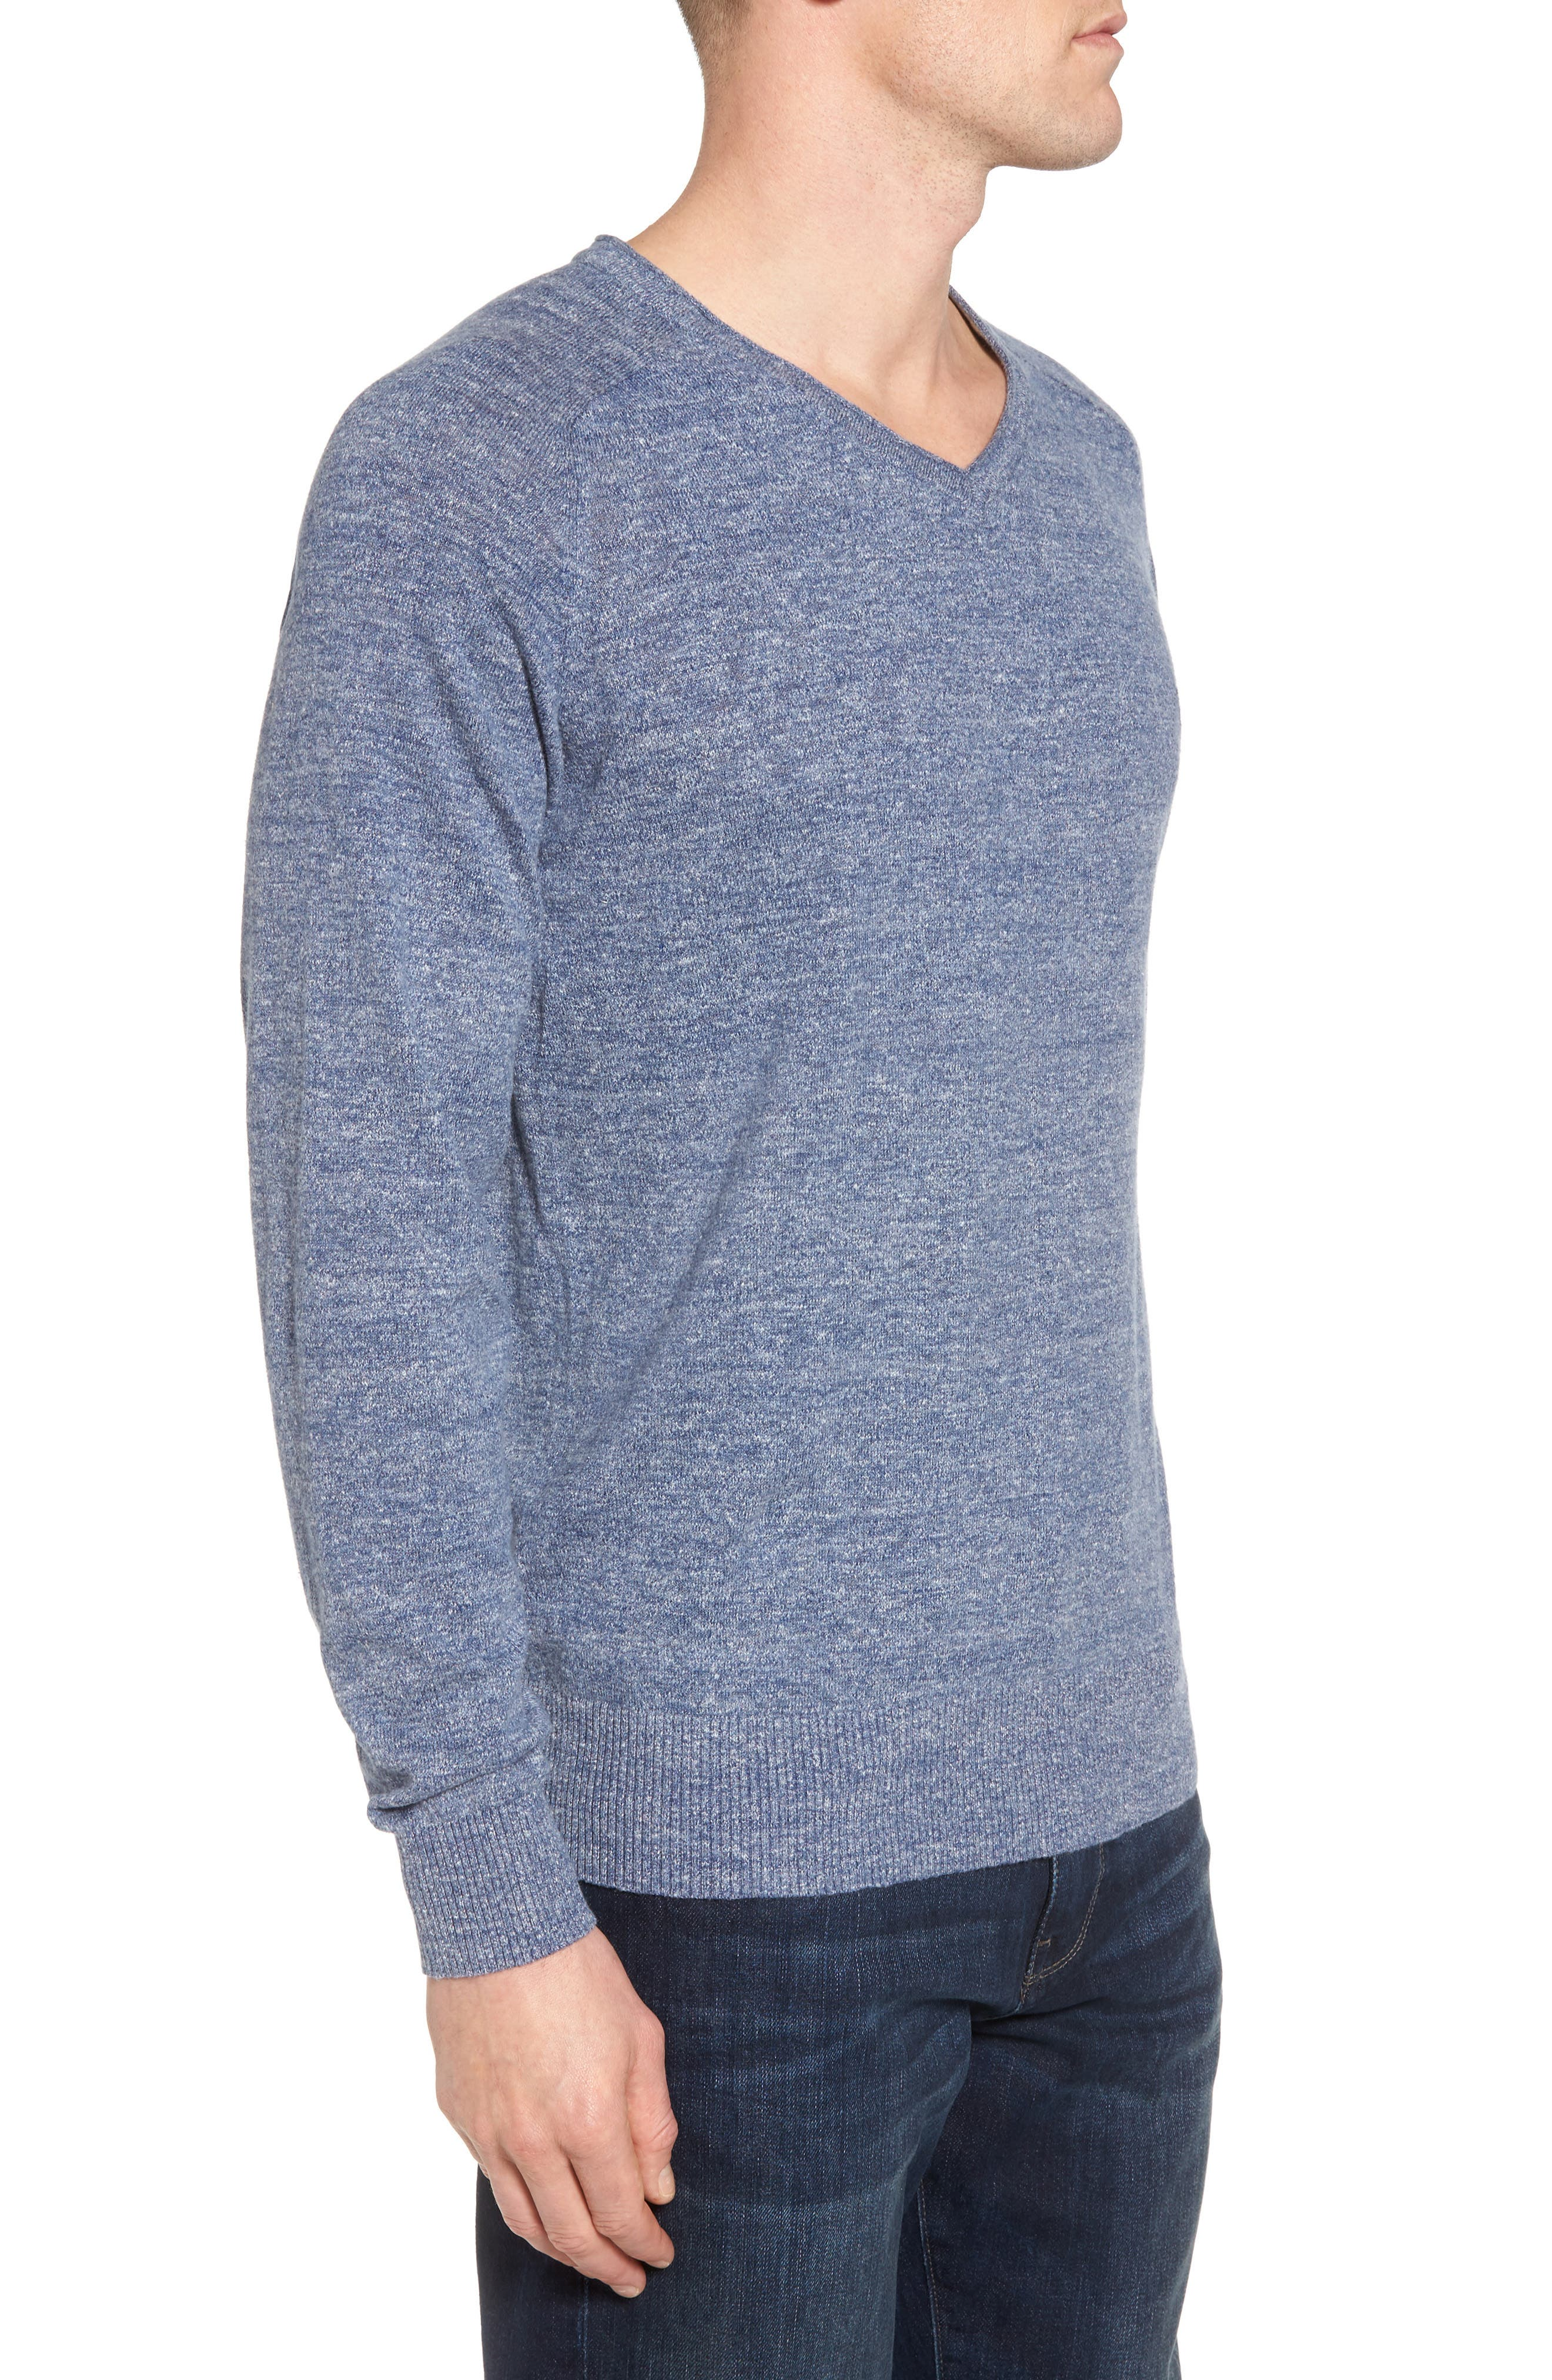 Arbors Cotton V-Neck Sweater,                             Alternate thumbnail 3, color,                             Riviera